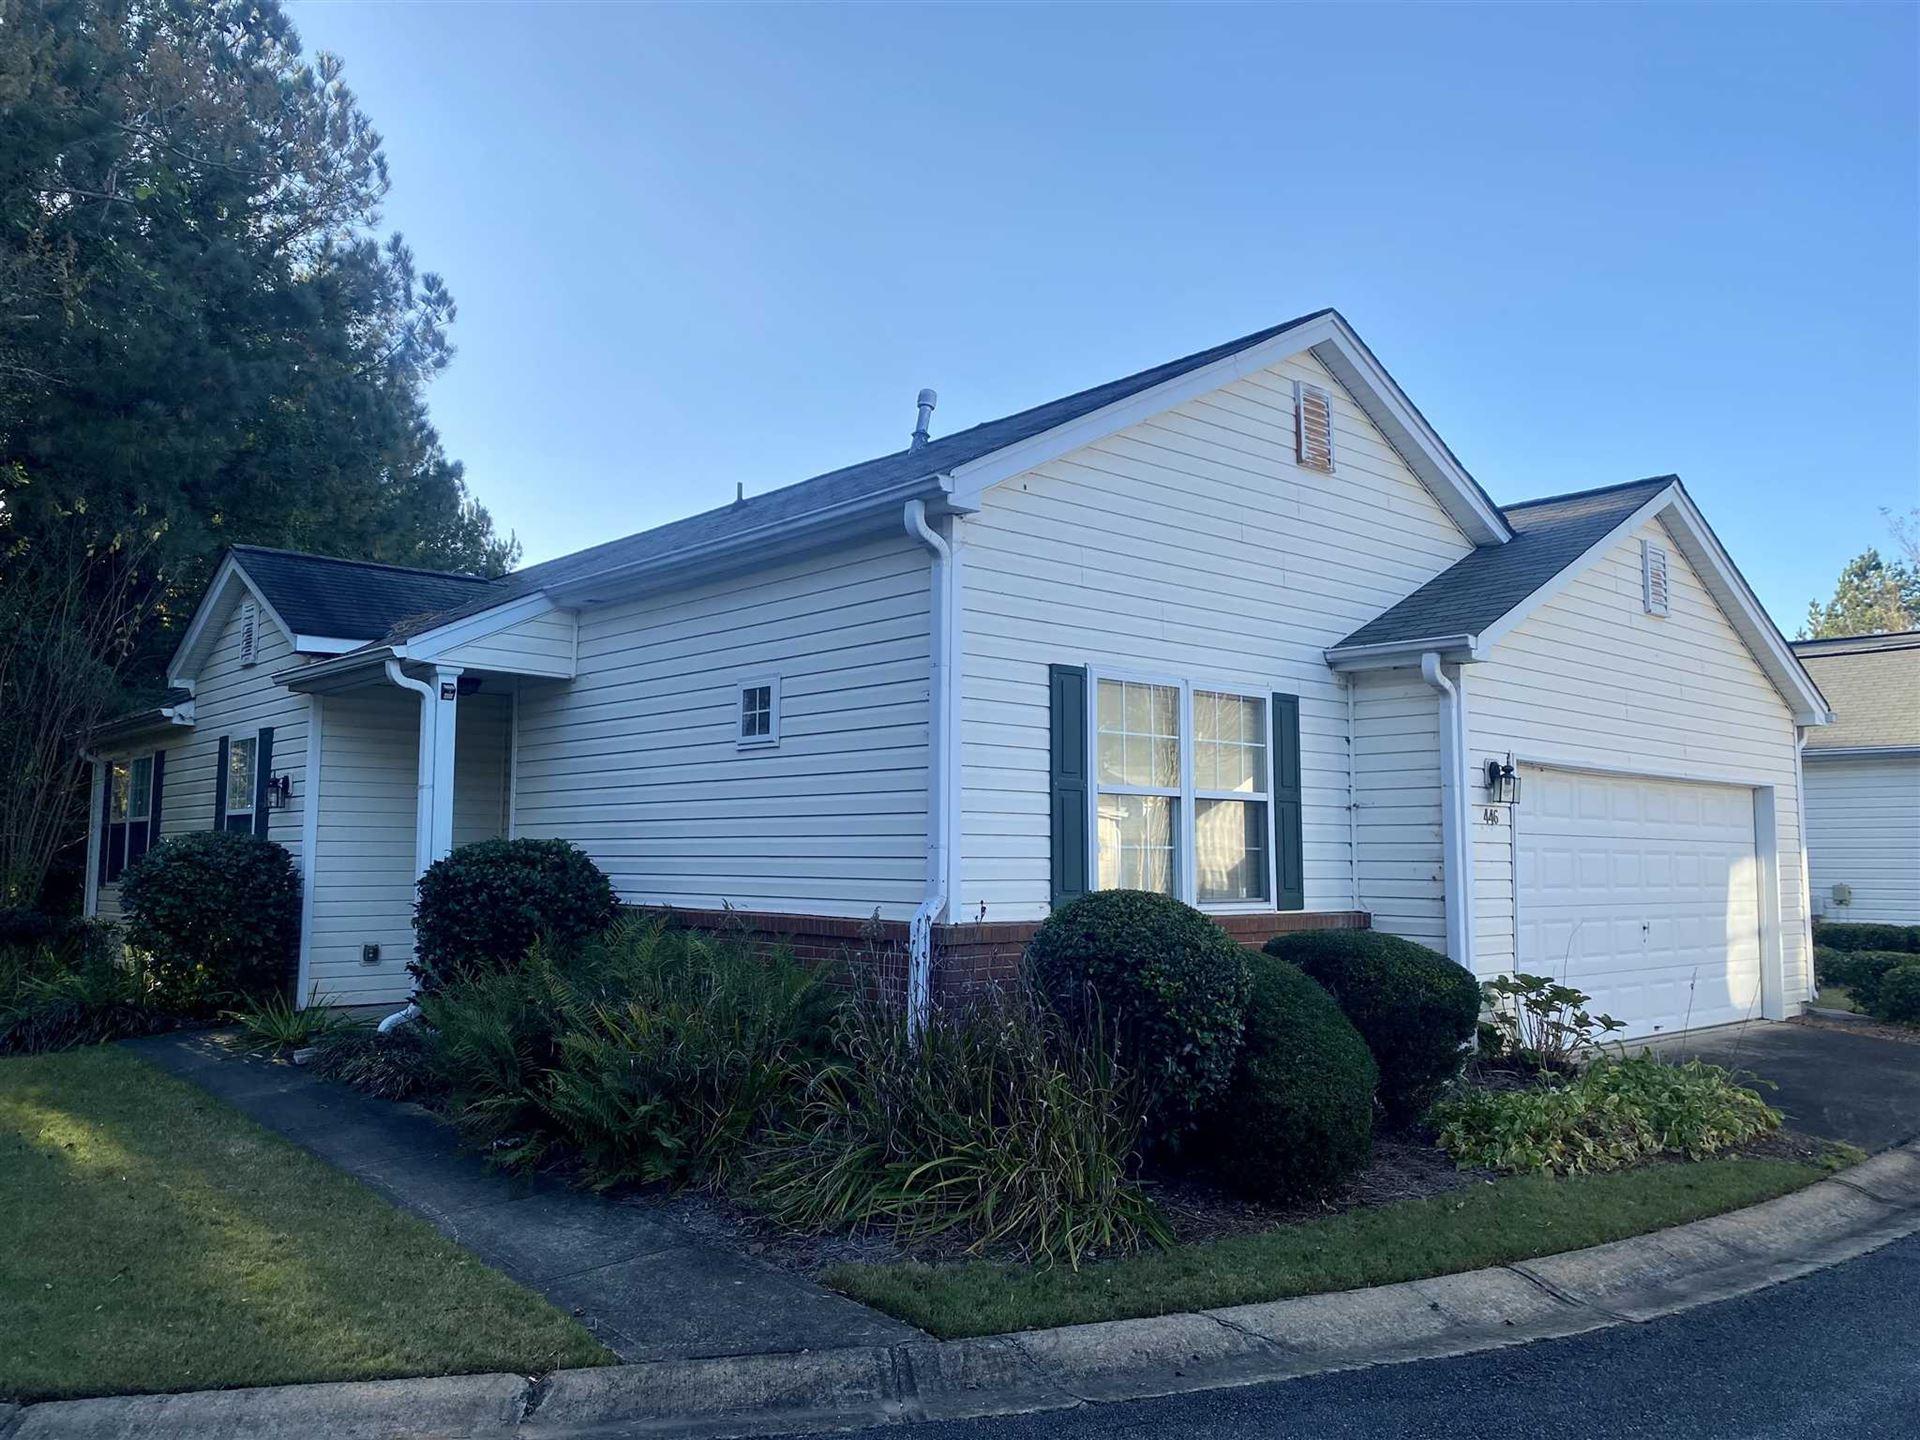 446 Windcroft Cir, Acworth, GA 30101 - MLS#: 8892820